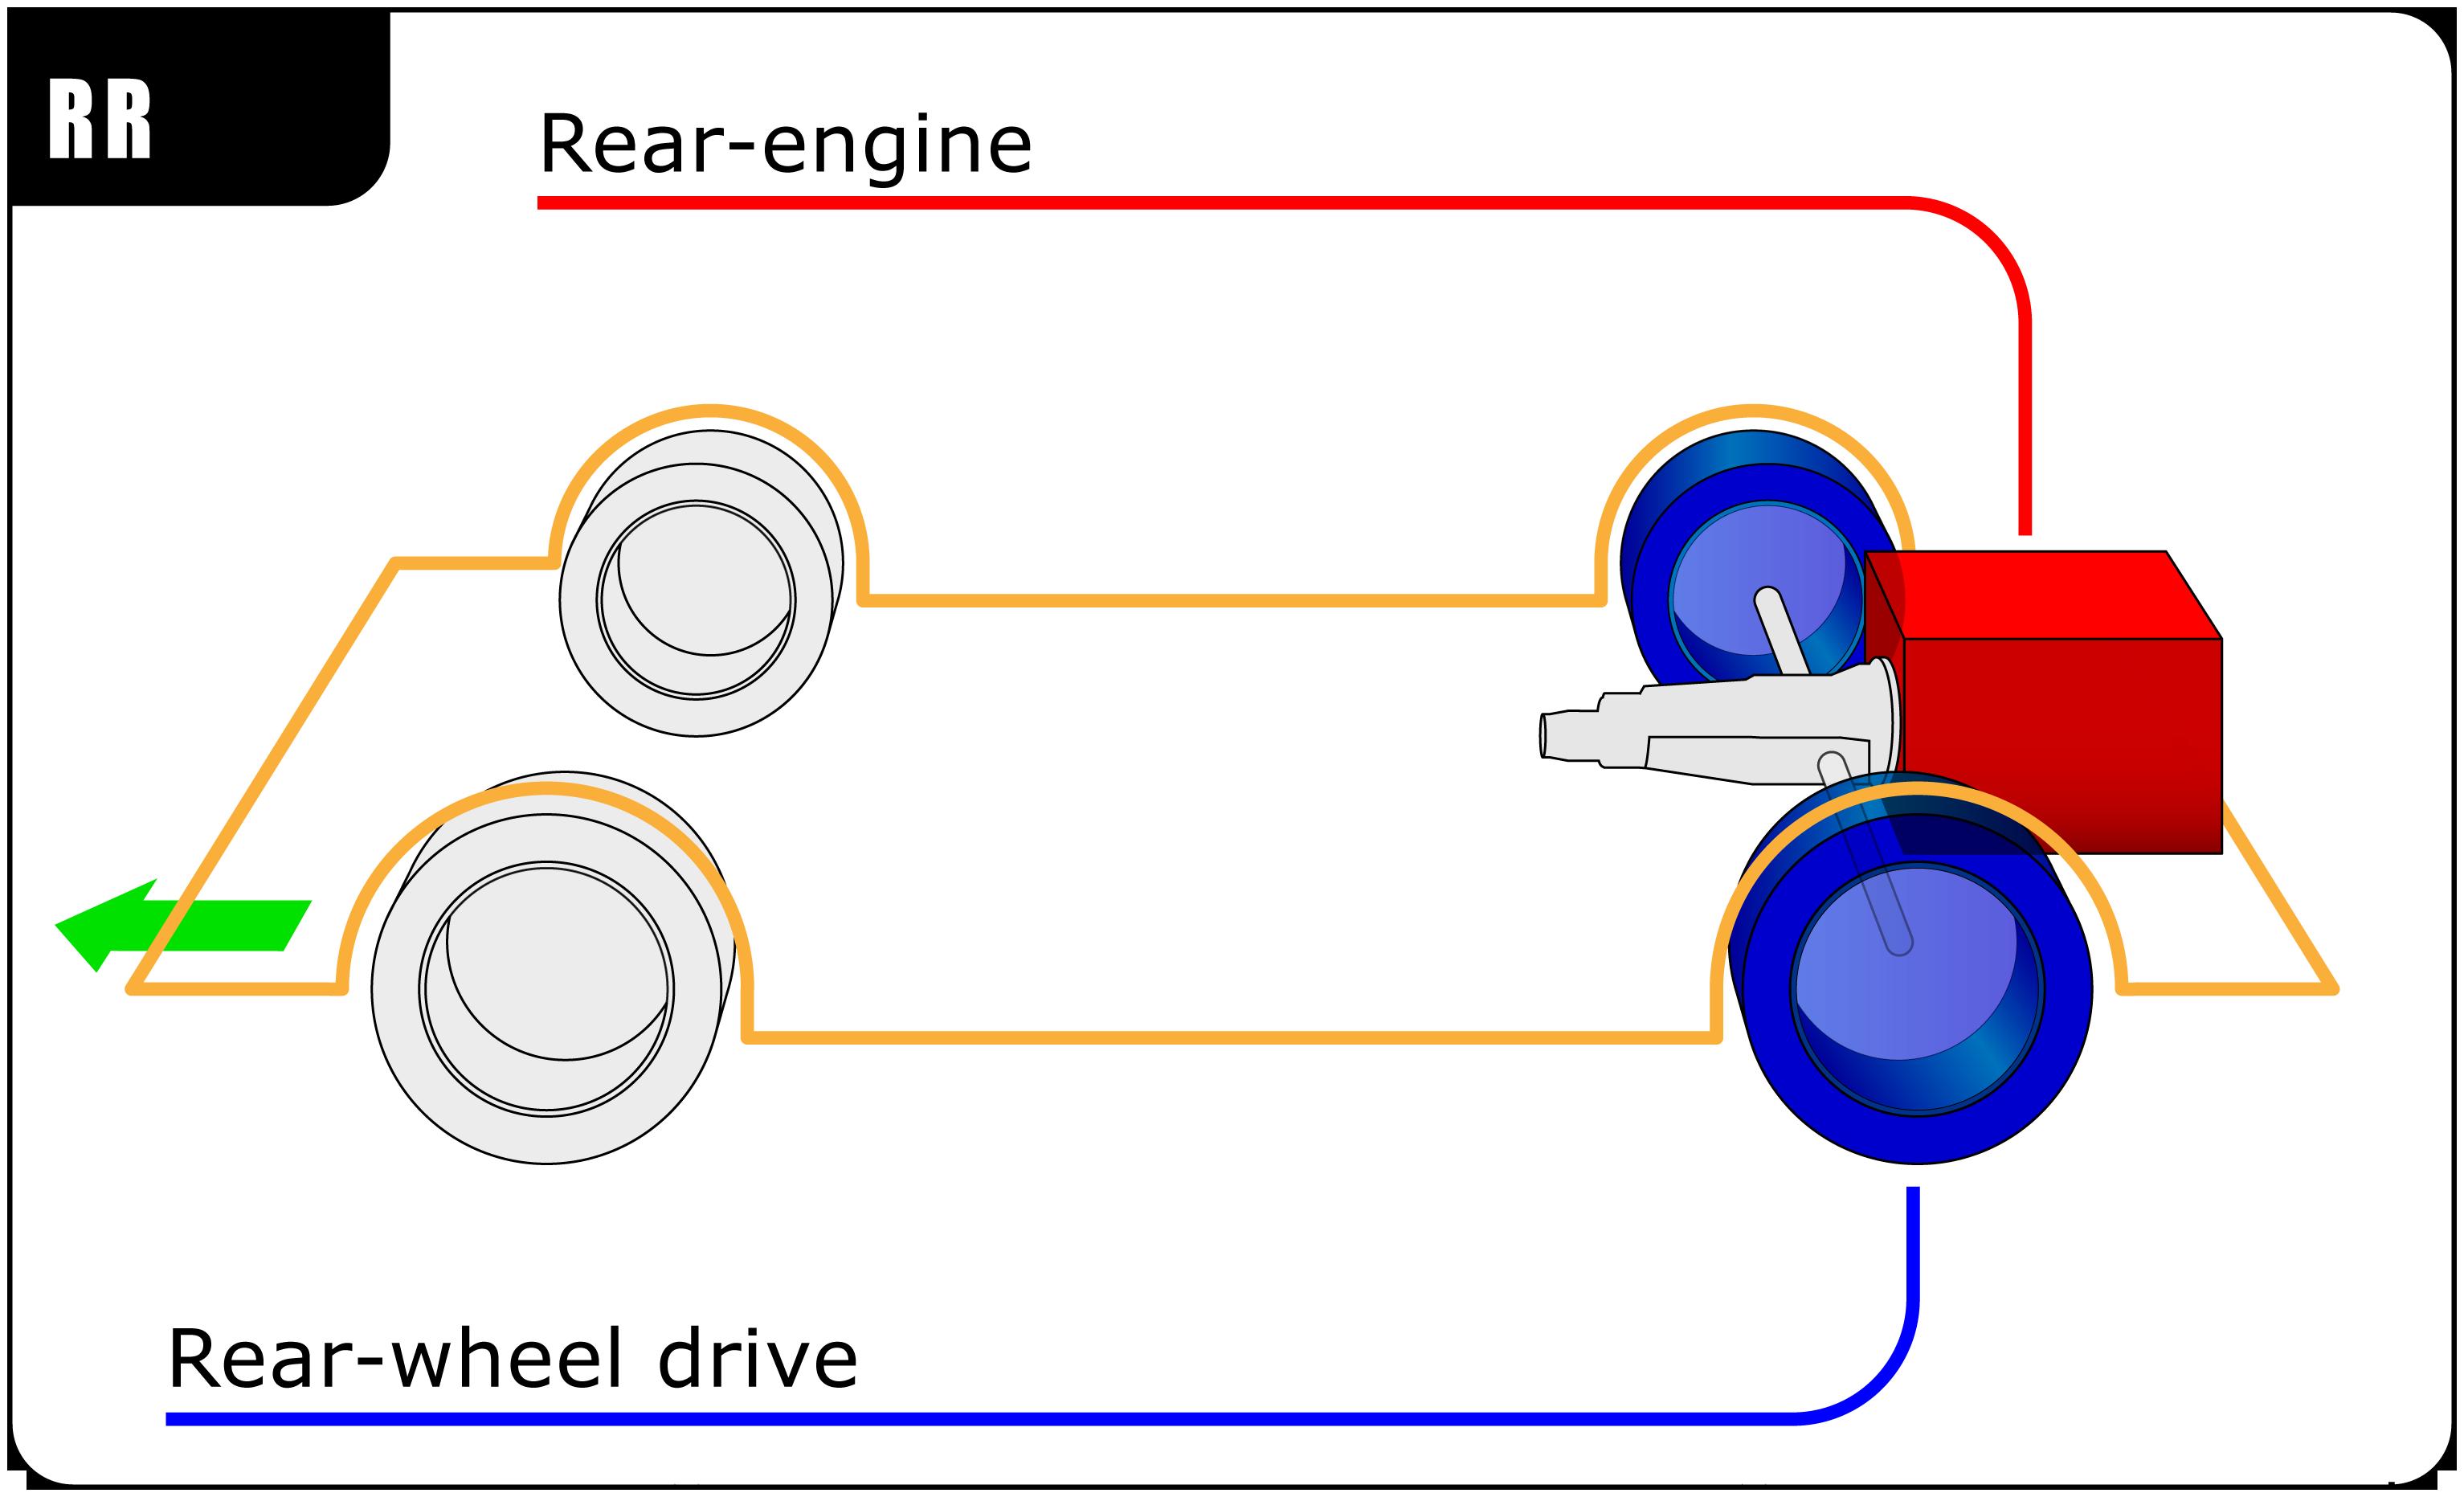 Rear-engine design